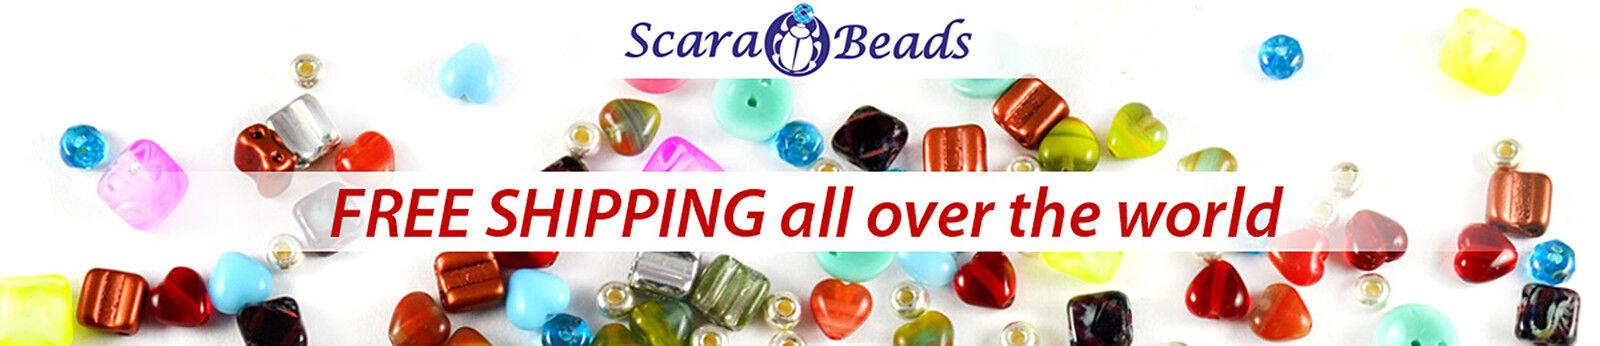 CzechBeads-ScaraBeads